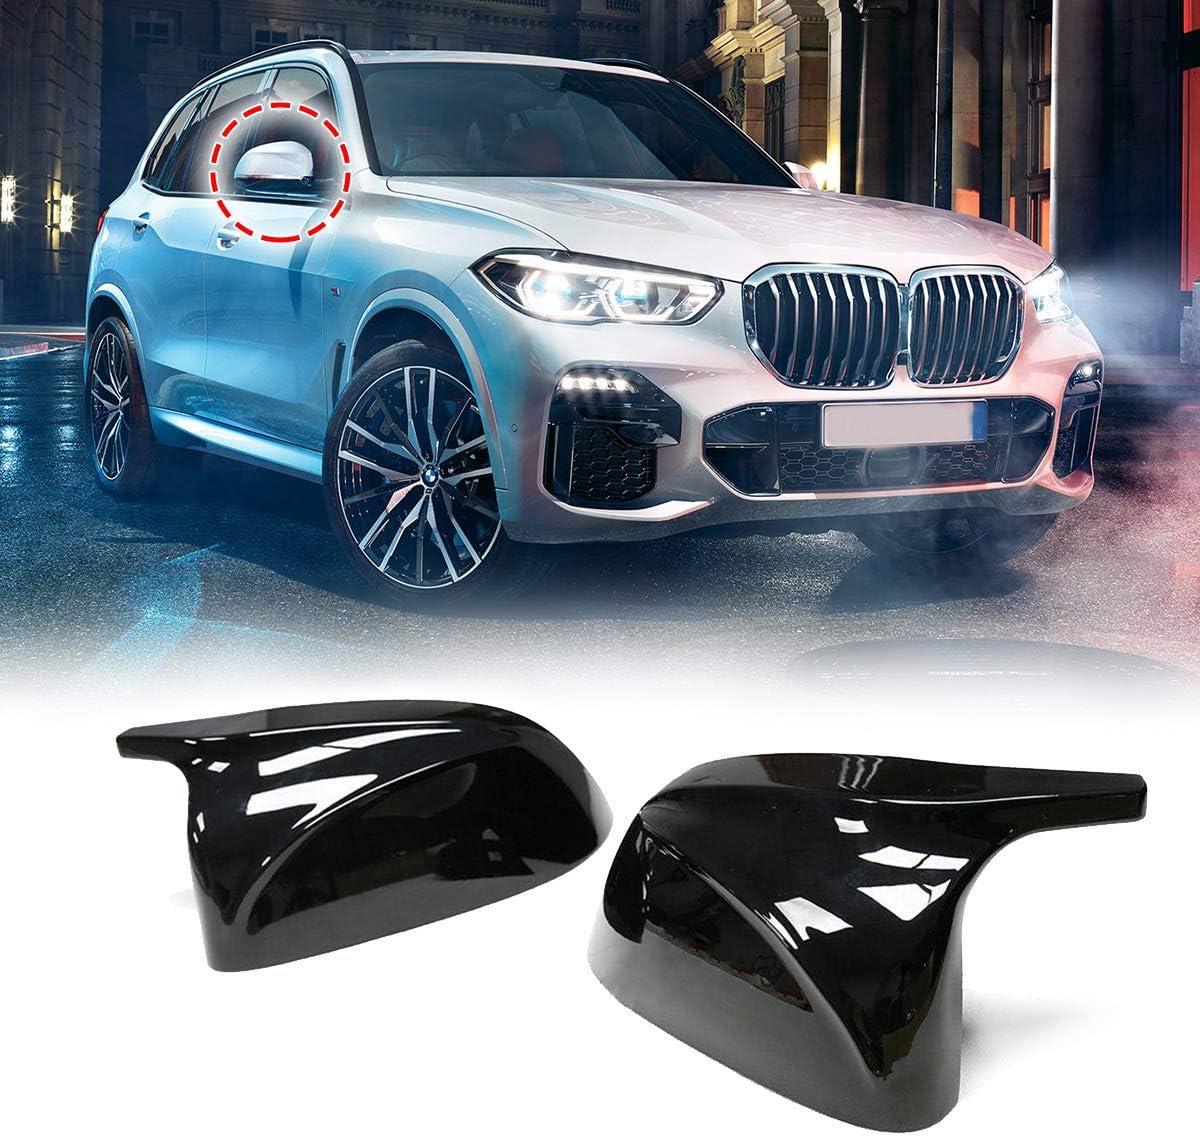 JenNiFer Glossy Black Side Autospiegelabdeckung F/ür BMW X3 G01 2018 F/ür BMW X7 G07 2018 + F/ür BMW X5 G05 2018 F/ür BMW X4 G02 2018